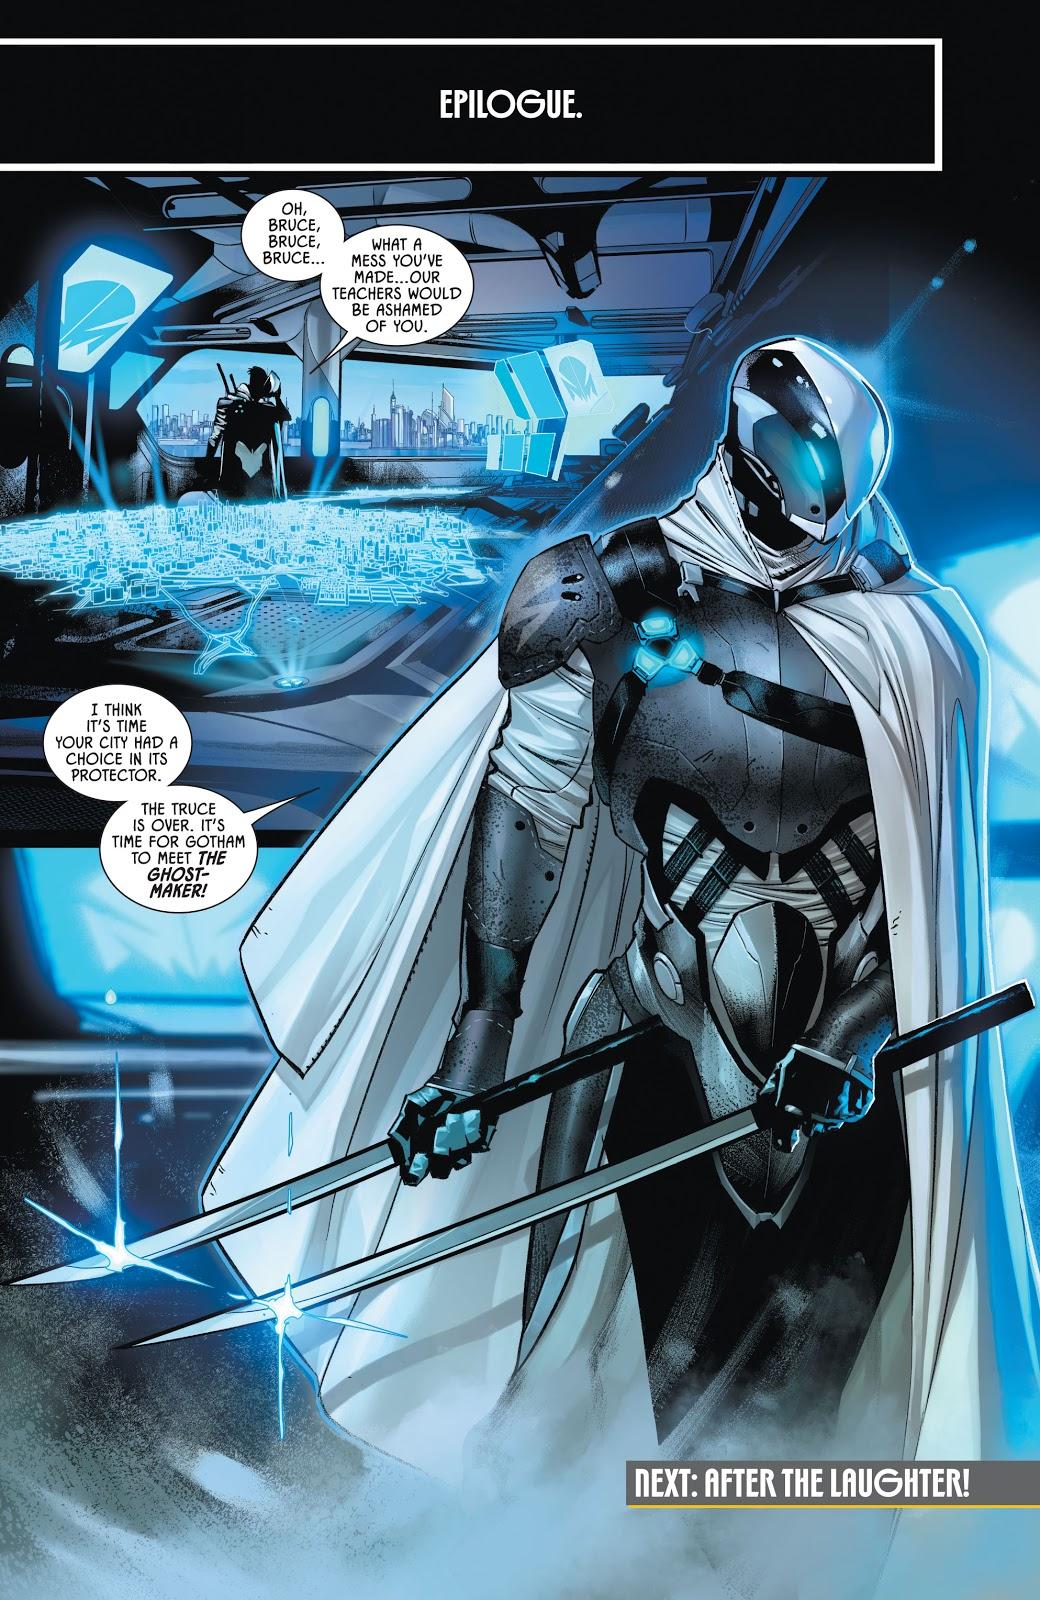 The Ghostmaker (Batman Vol. 3 #100)